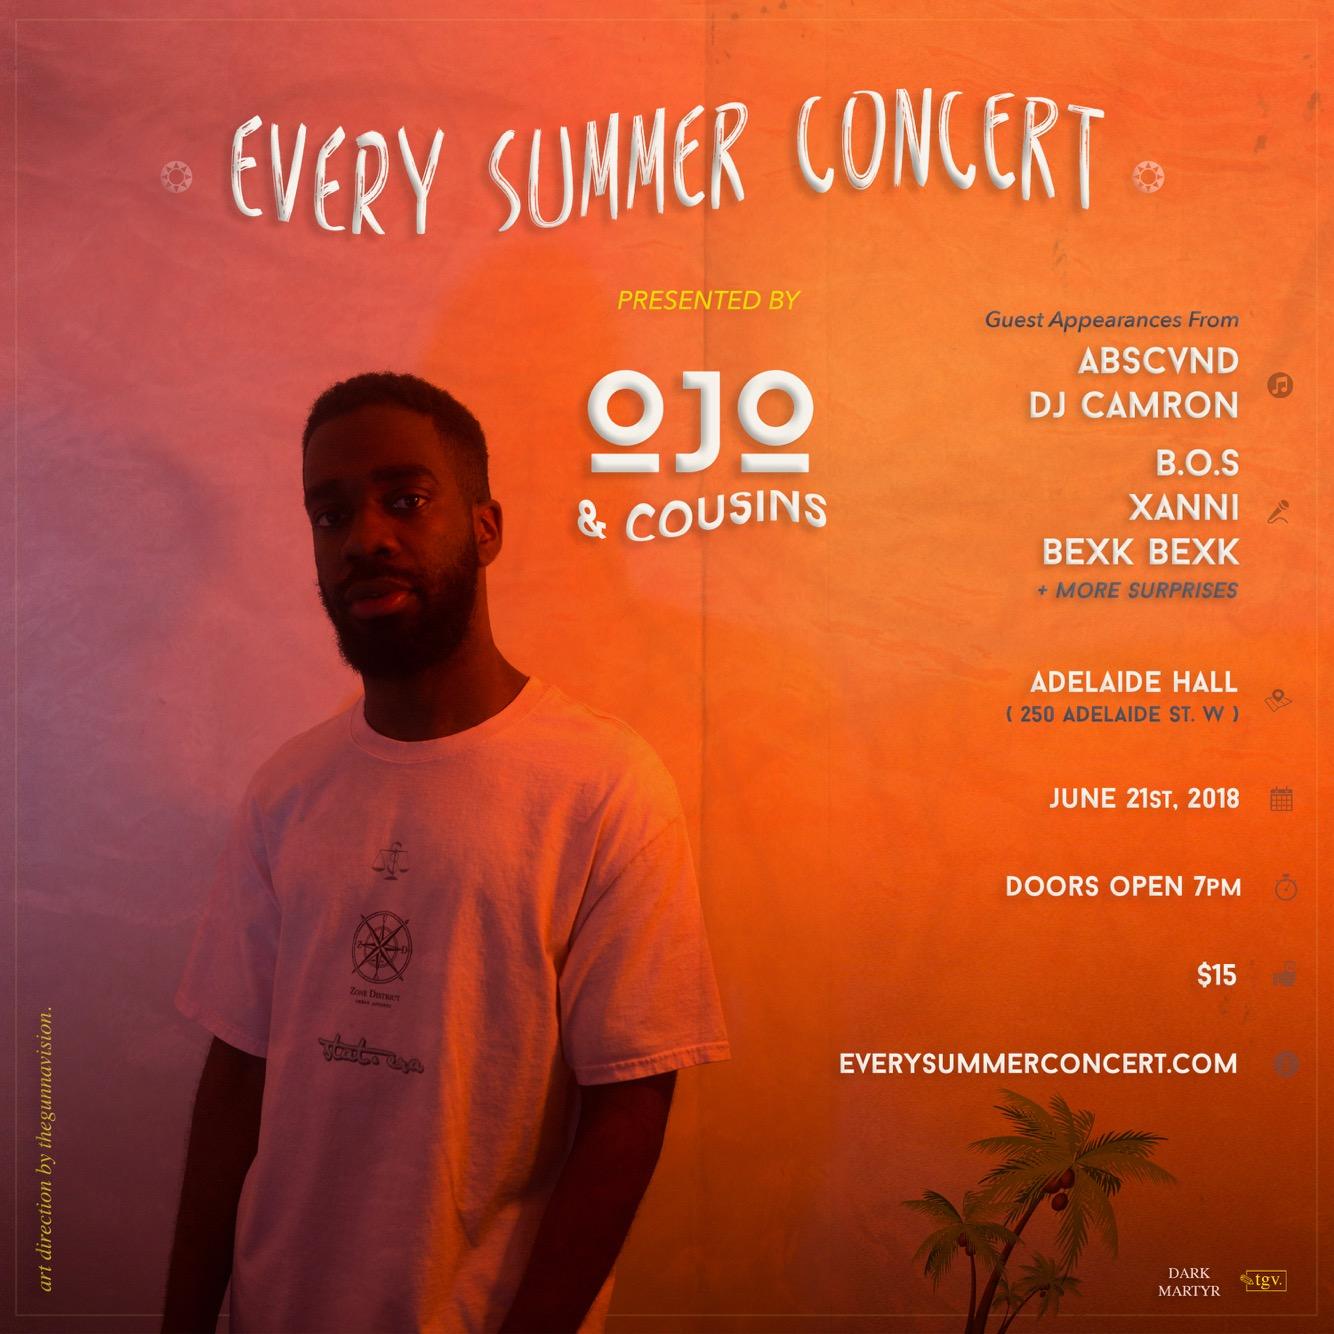 Every Summer Concert